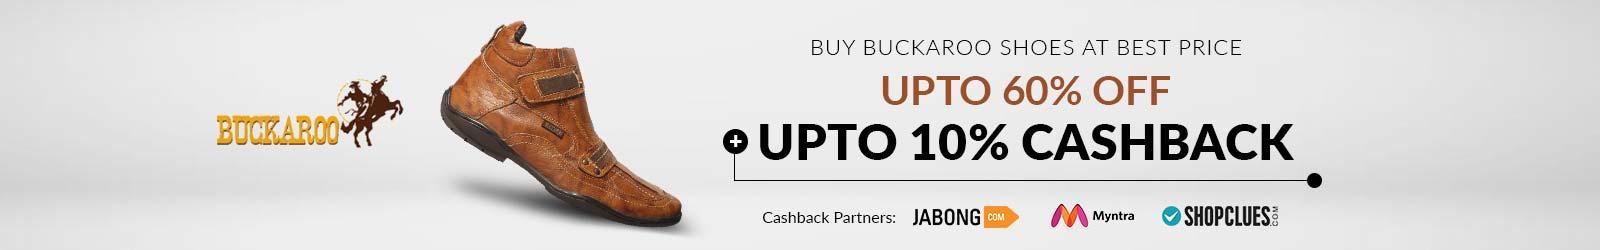 Buckaroo Shoes Price List India 60 Off Offers Buckaroo Shoes